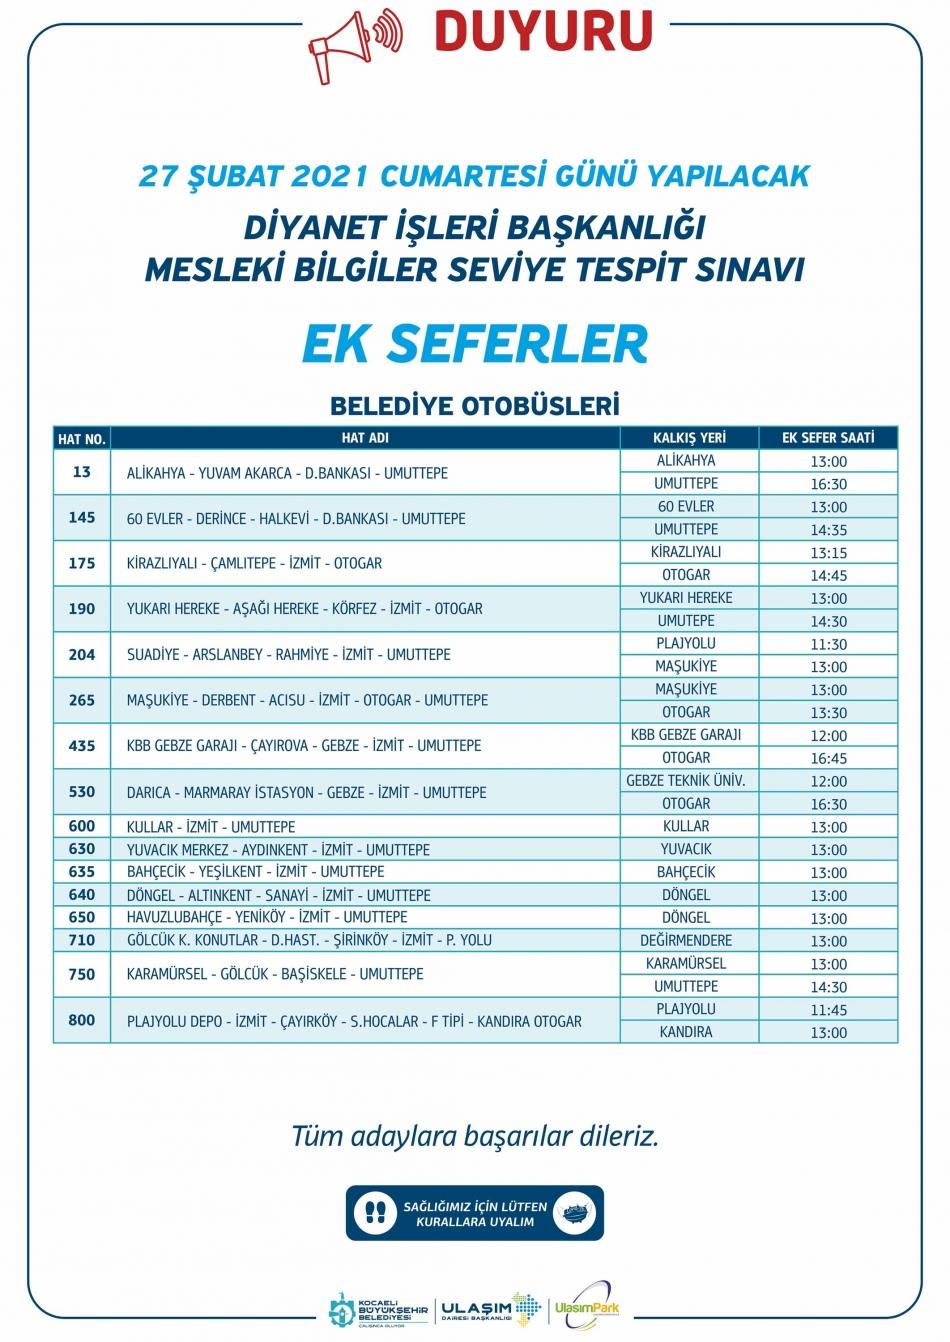 2021/02/1614349560_dIyanet_ISlerI_baSkanliGi_ek_seferler_2021_-_26-02-2021.jpg